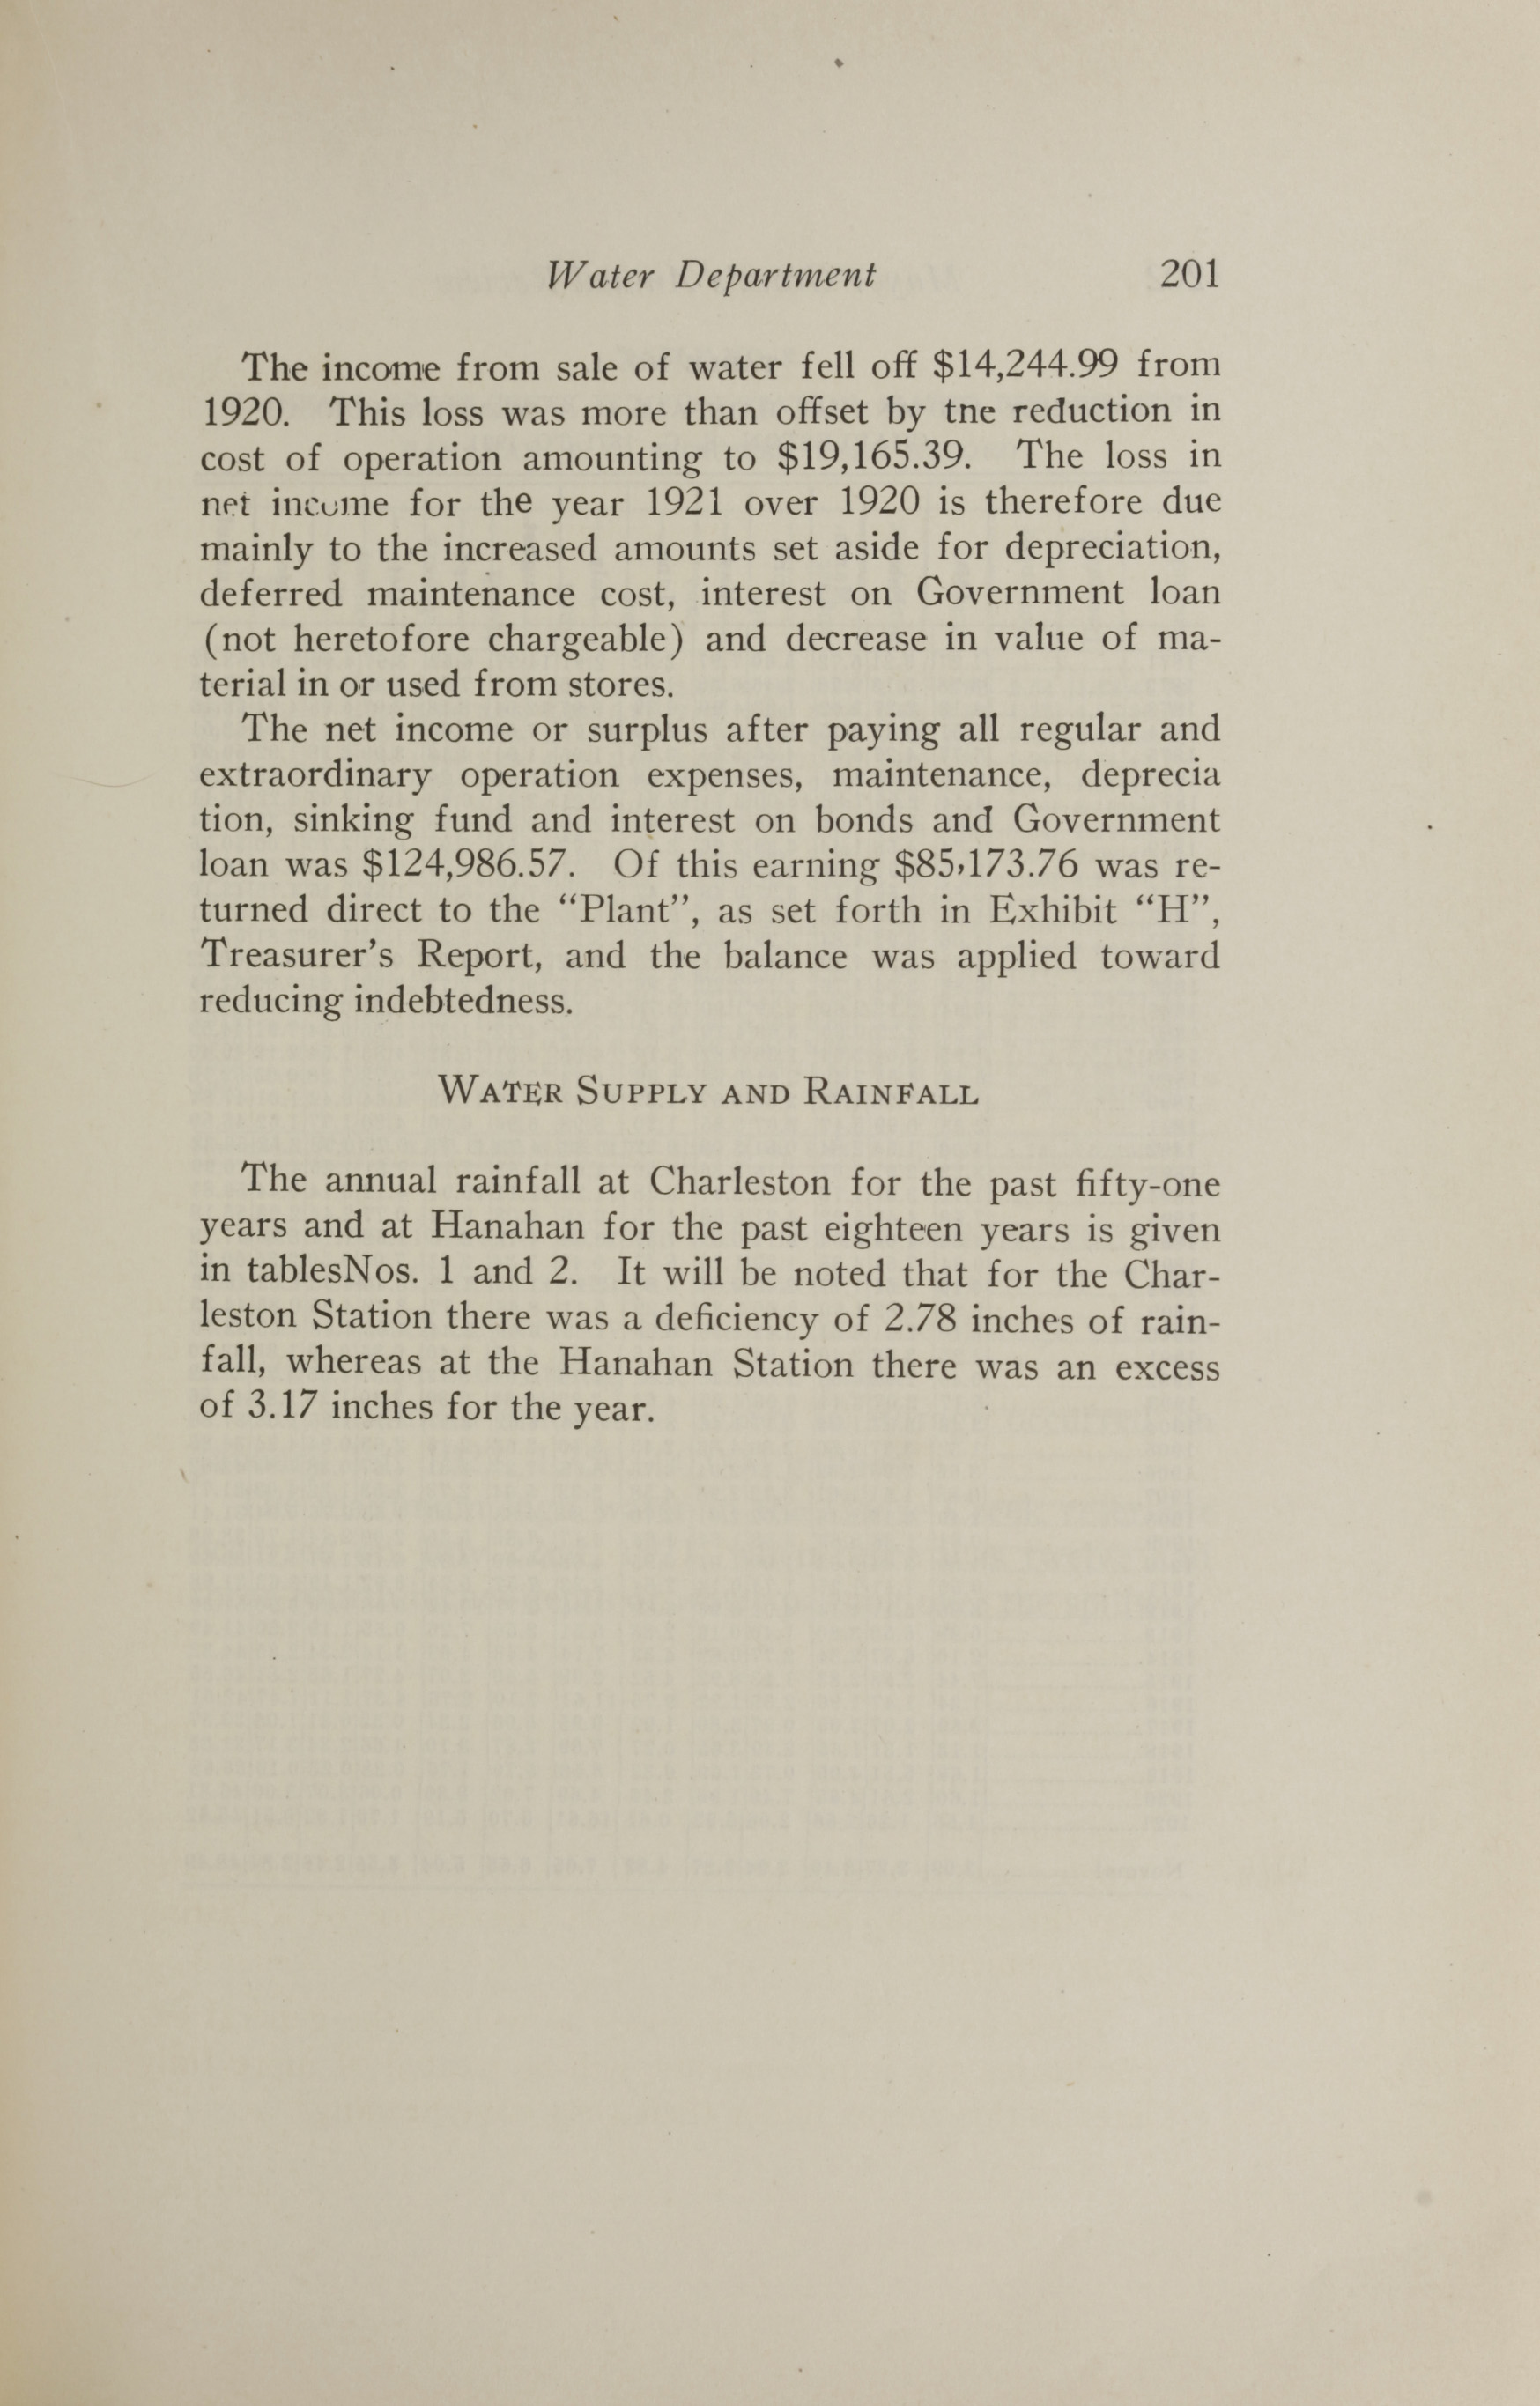 Charleston Yearbook, 1921, page 201